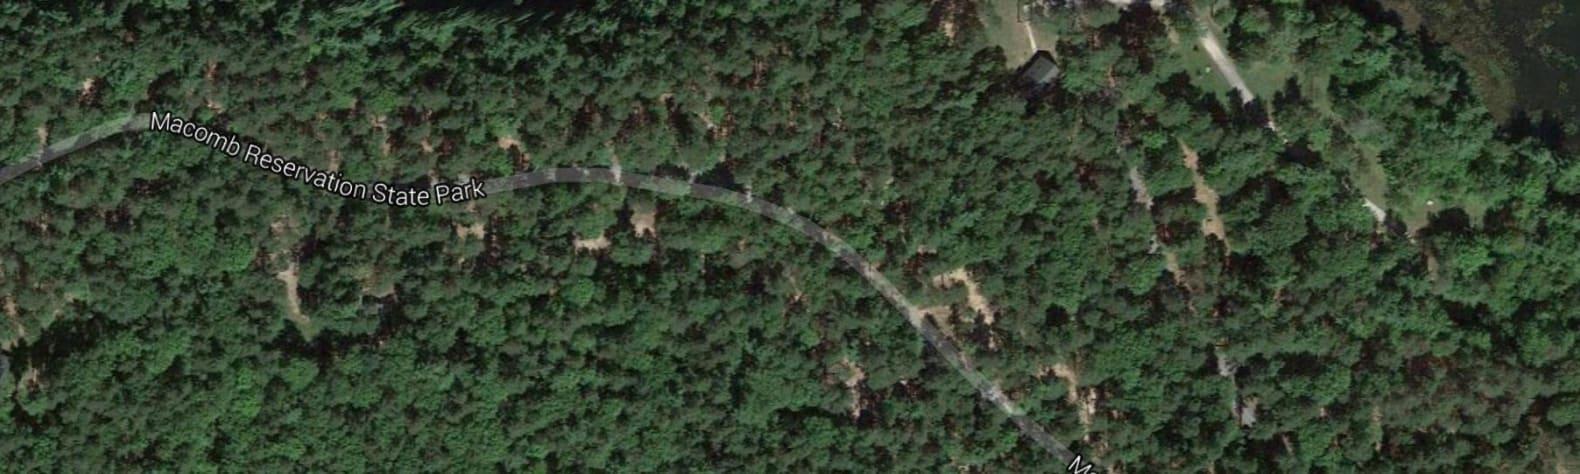 Macomb Reservation State Park